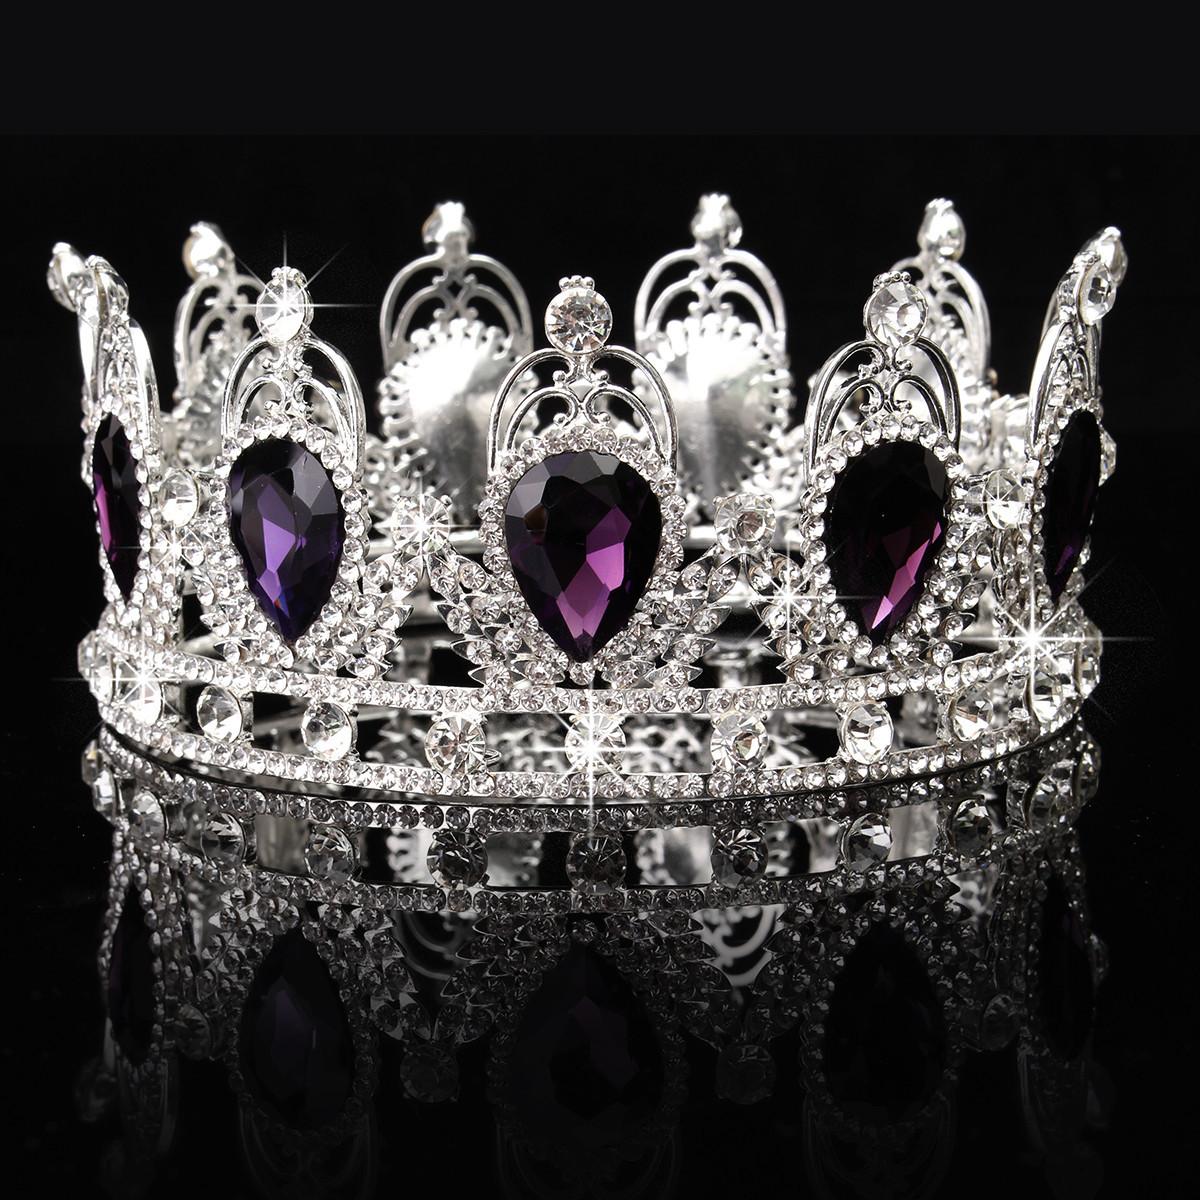 Princess-Bridal-Wedding-Prom-Headband-Crystal-Rhinestone-Pearl-Veil-Tiara-Crown thumbnail 22